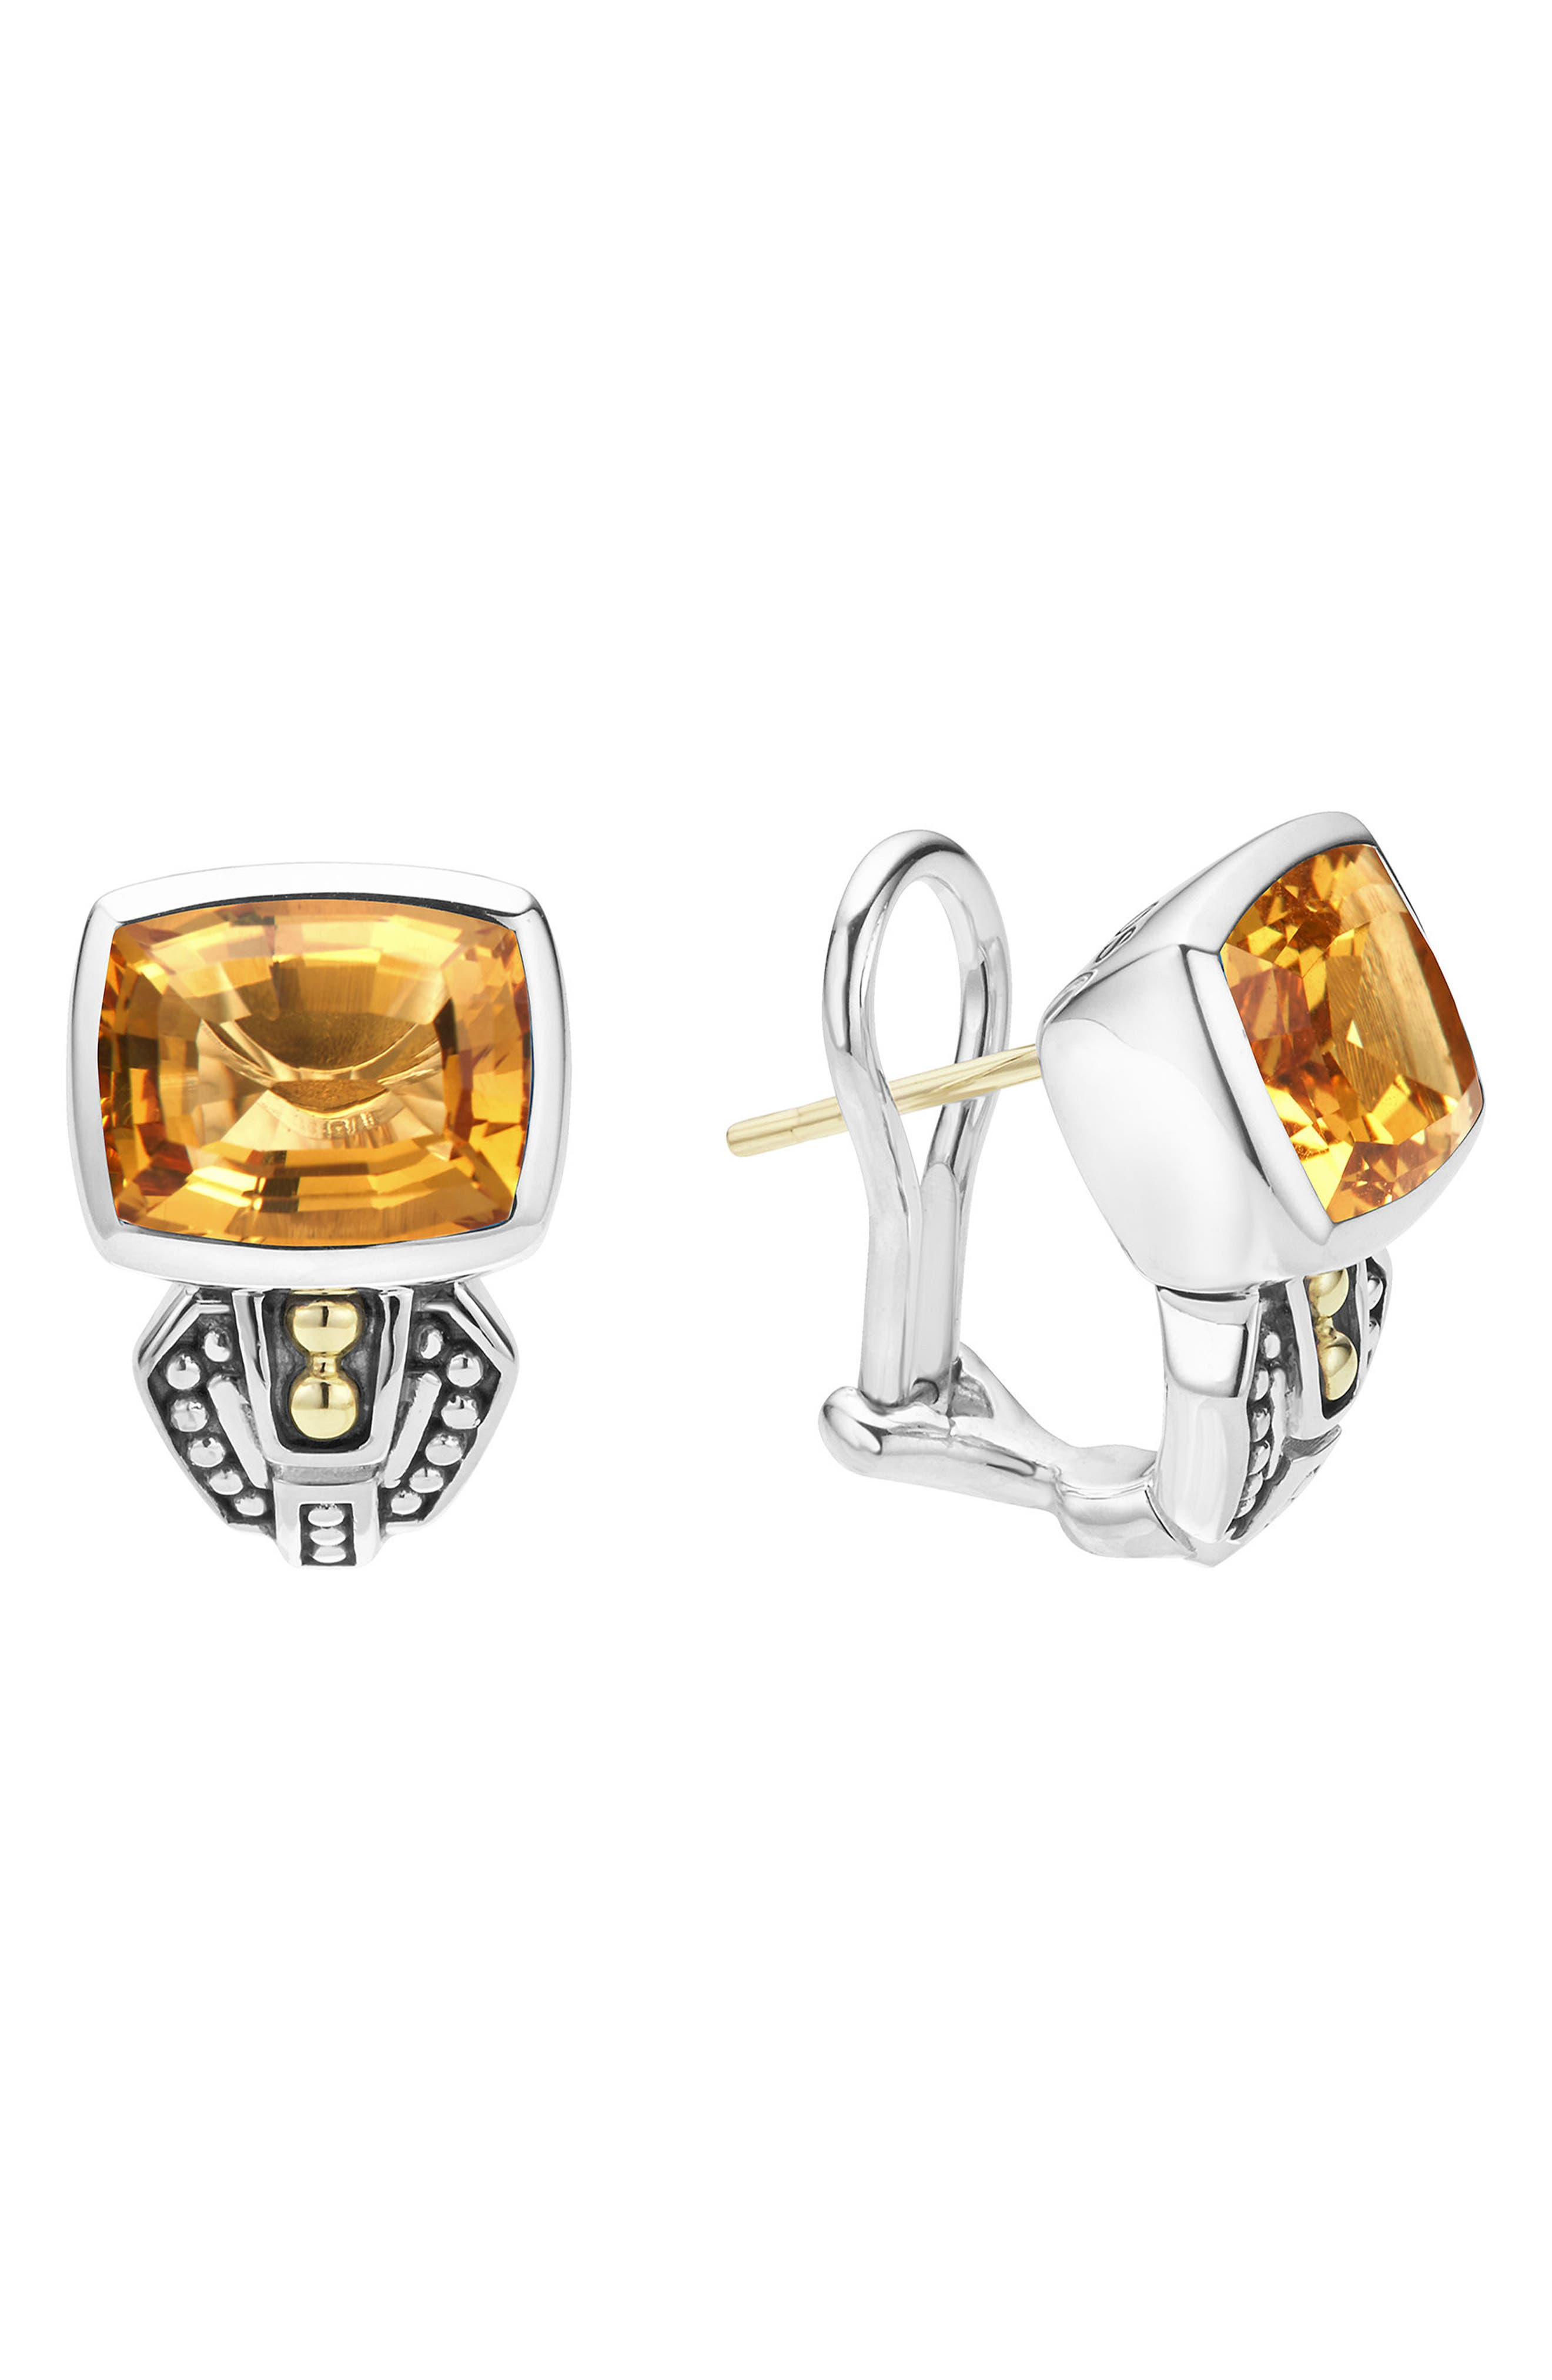 LAGOS 'Caviar Color' Semiprecious Stone Stud Earrings